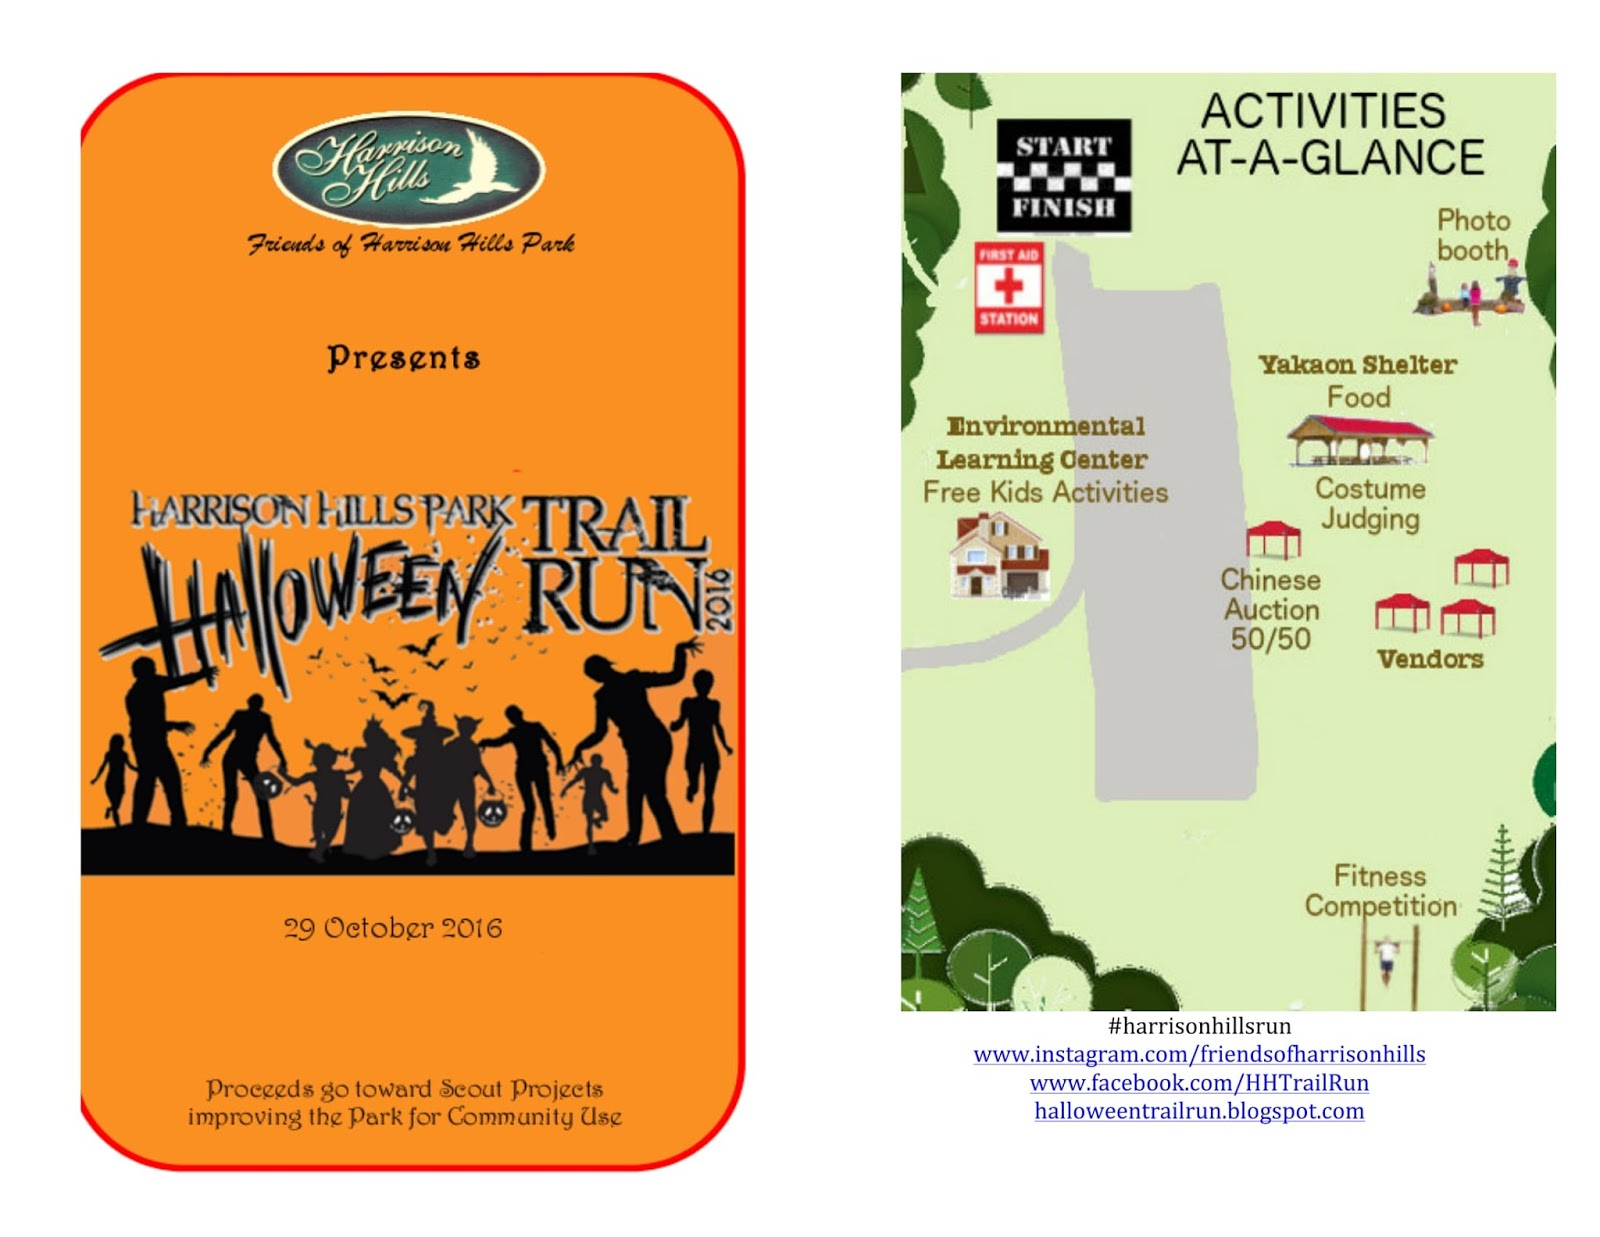 harrison hills 5k 10k halloween trail run 31st oct 2015 event